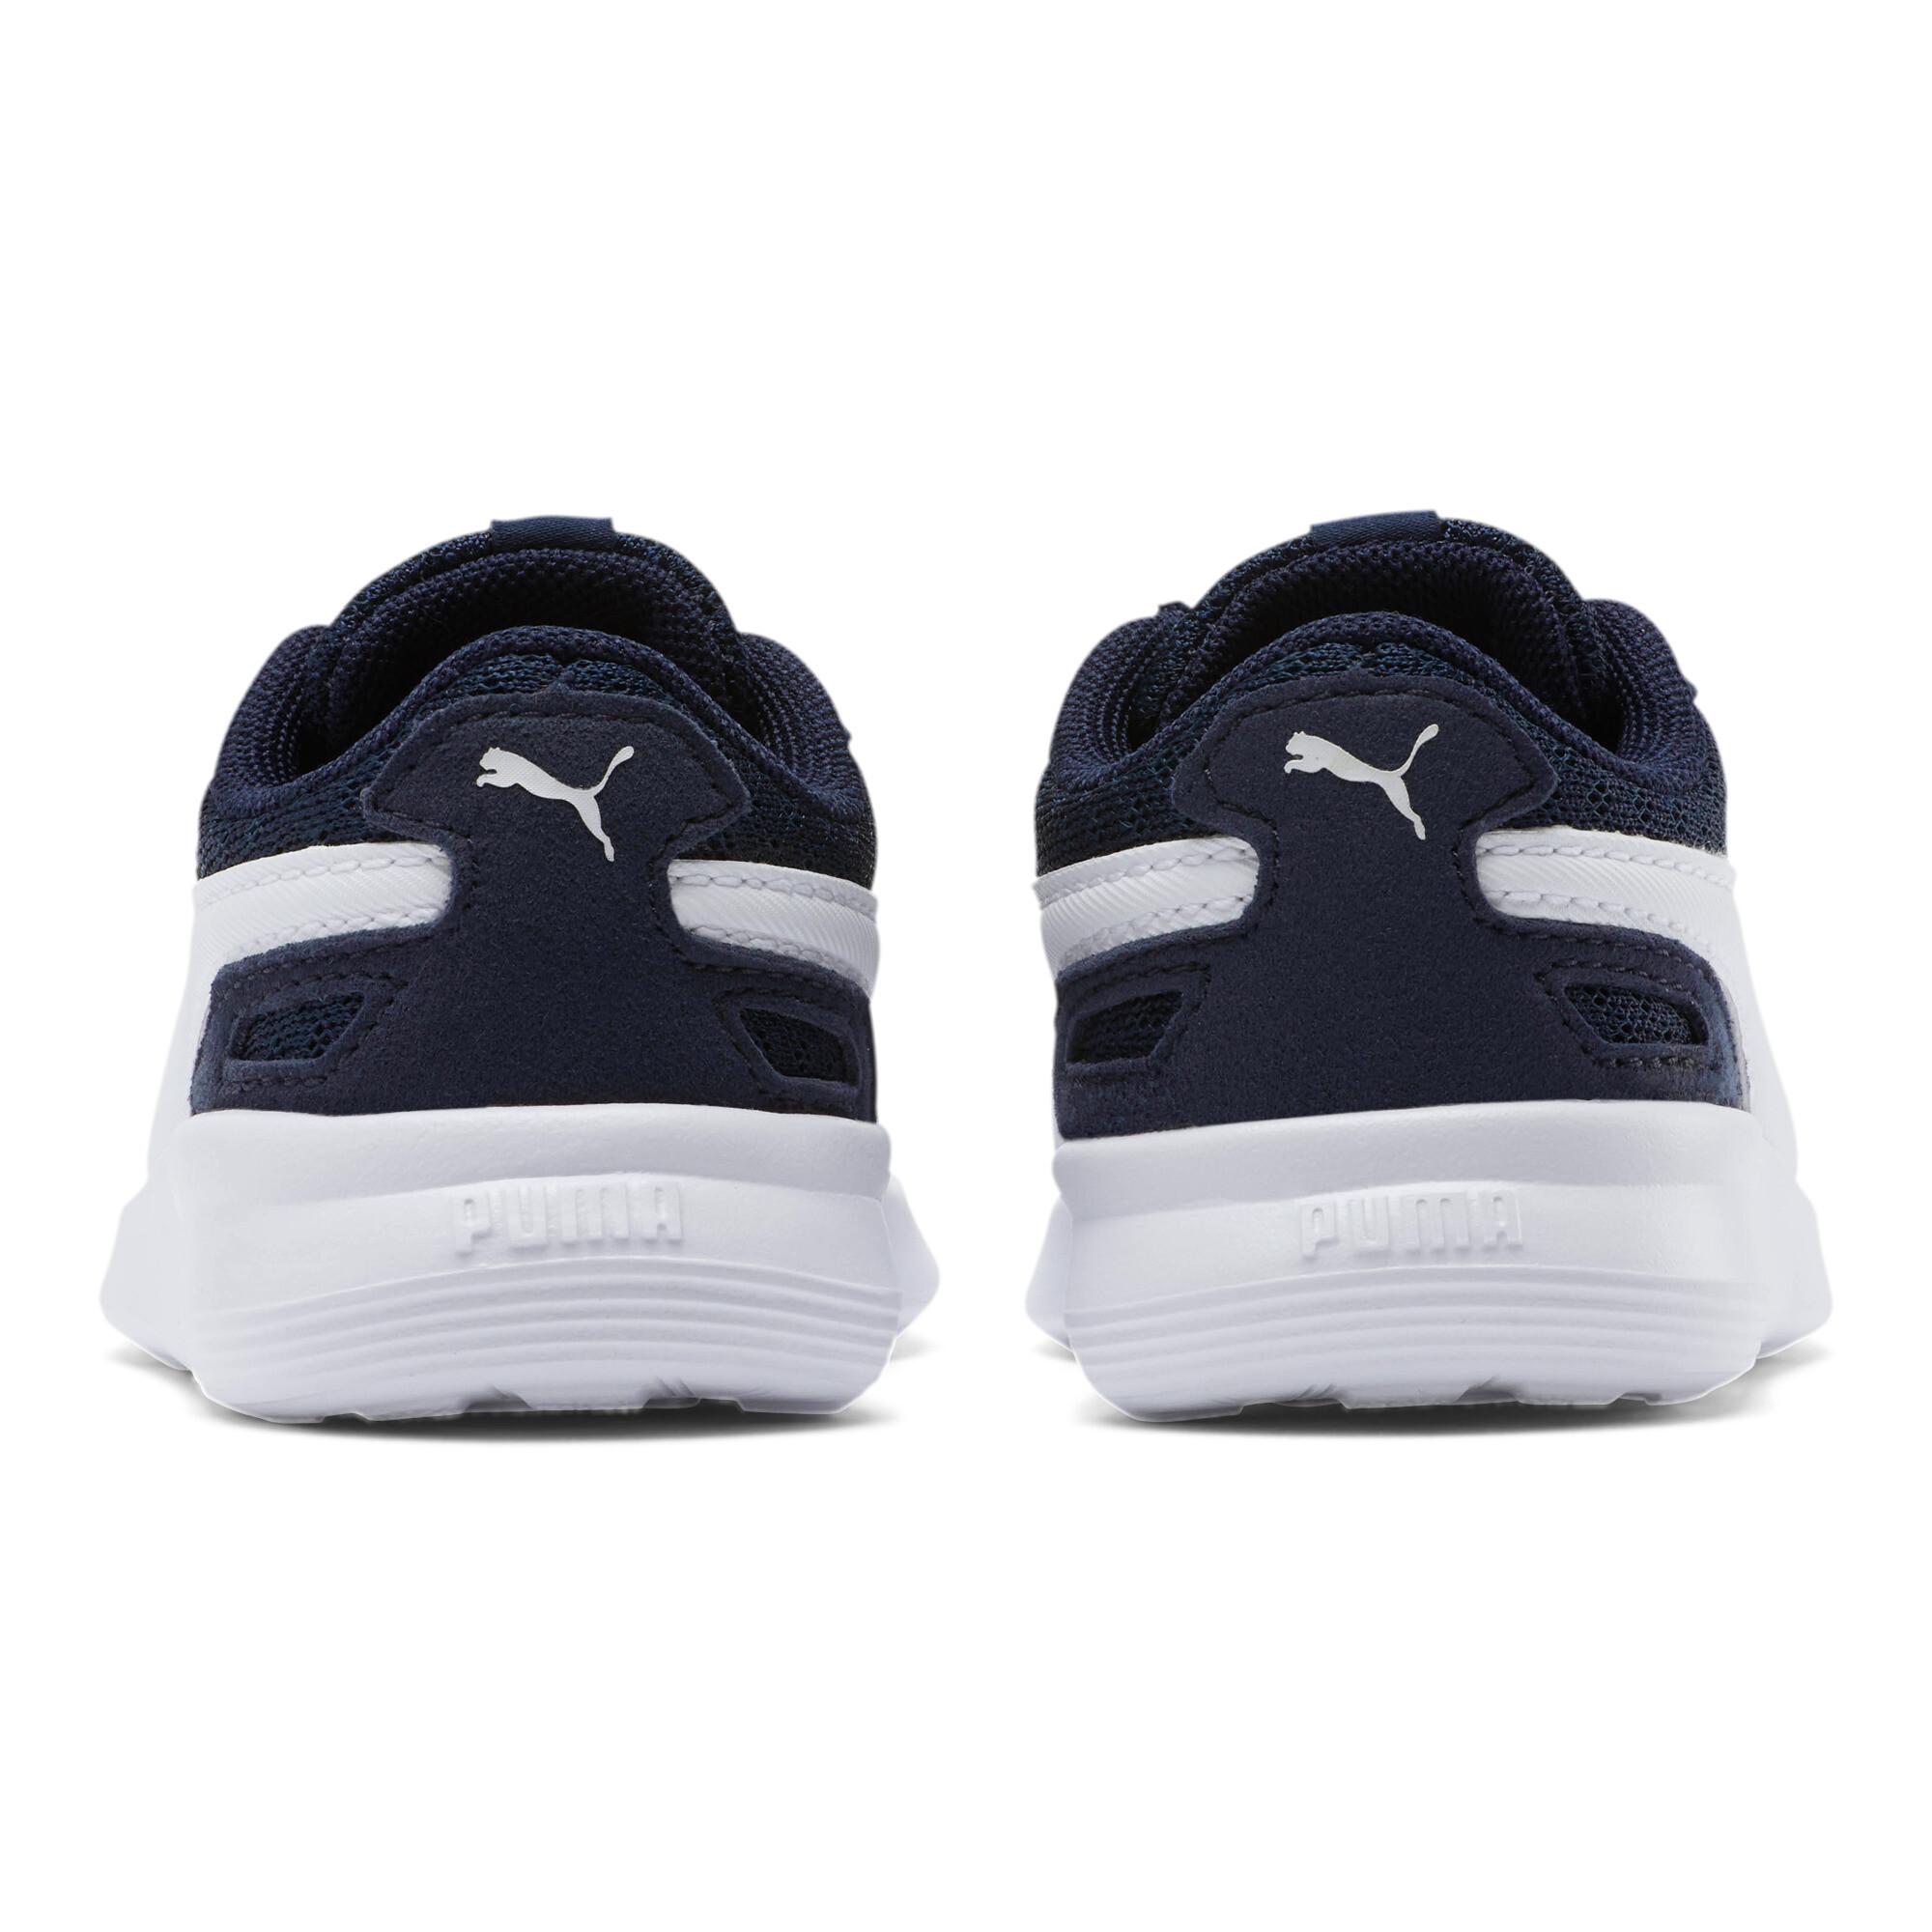 PUMA-ST-Activate-AC-Toddler-Shoes-Kids-Shoe-Kids thumbnail 9